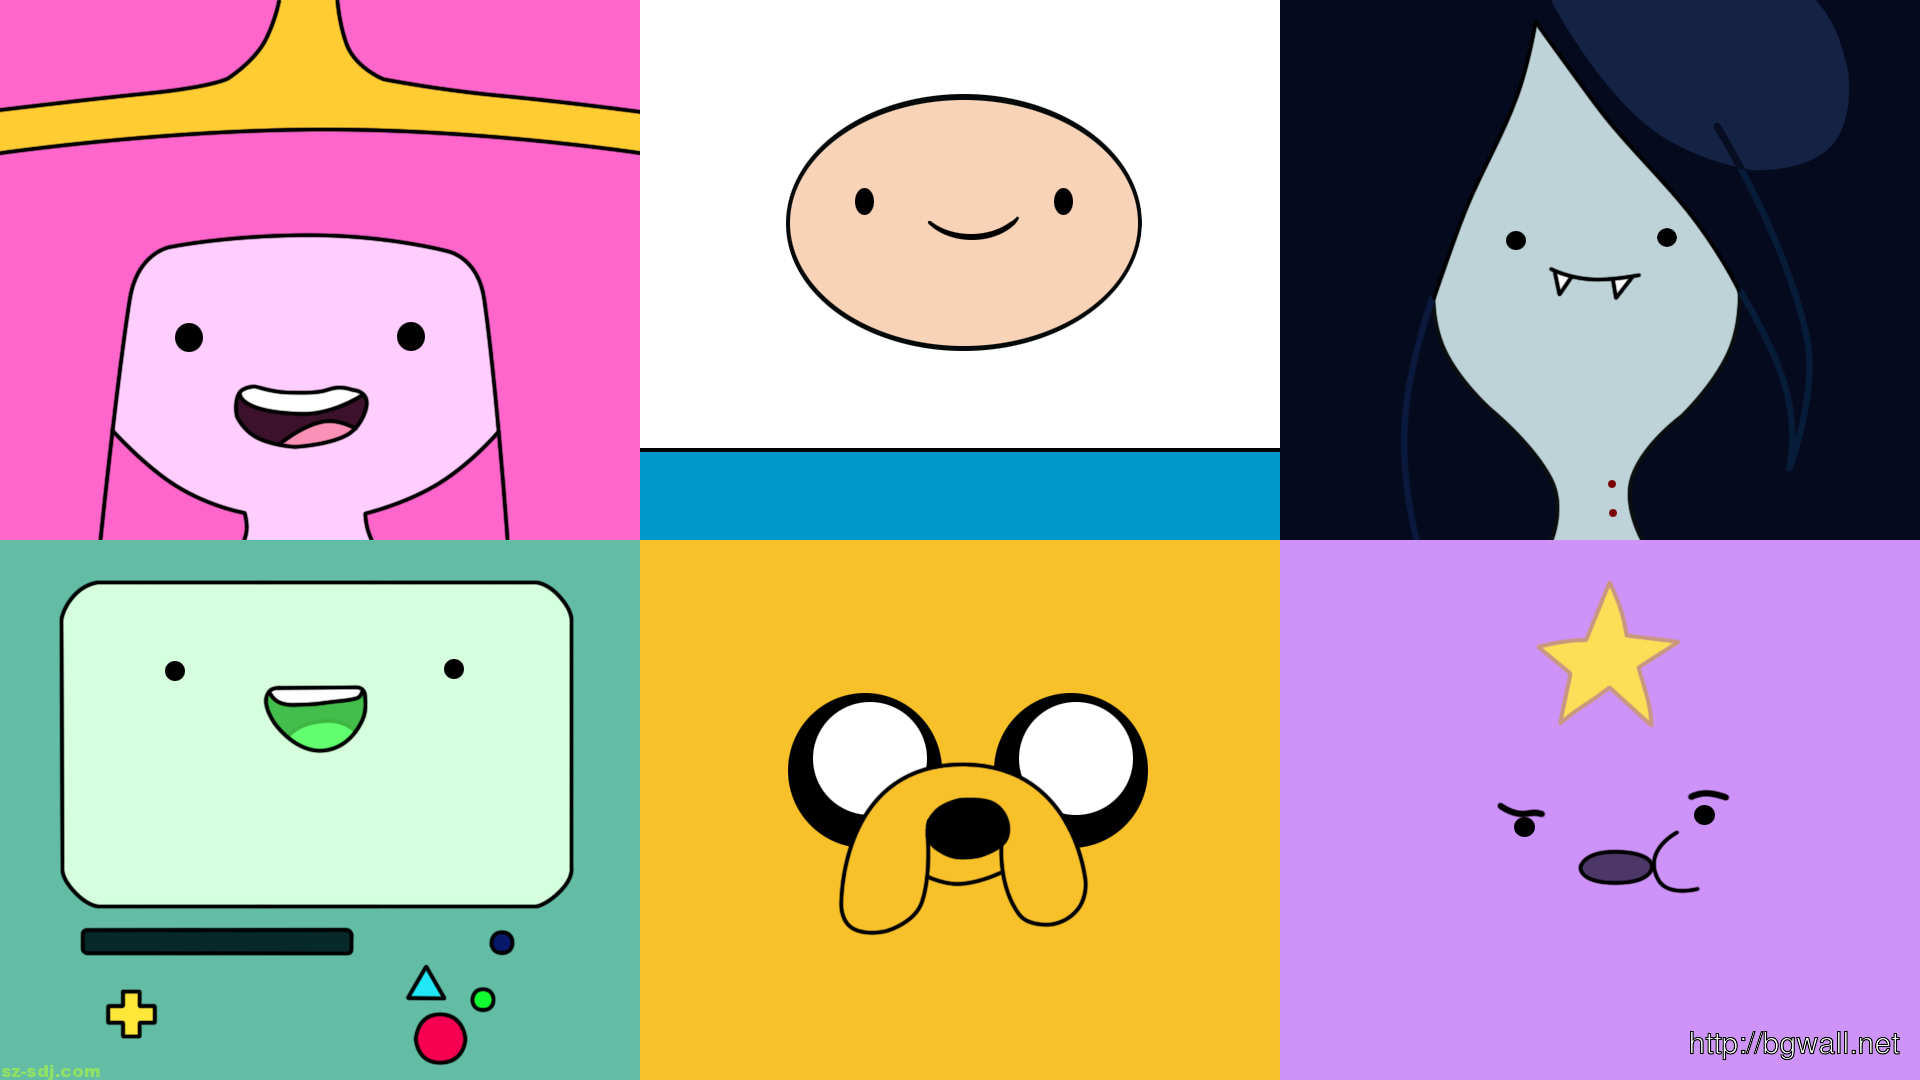 Cute Face Adventure Time Cartoons Wallpaper – Background Wallpaper ...